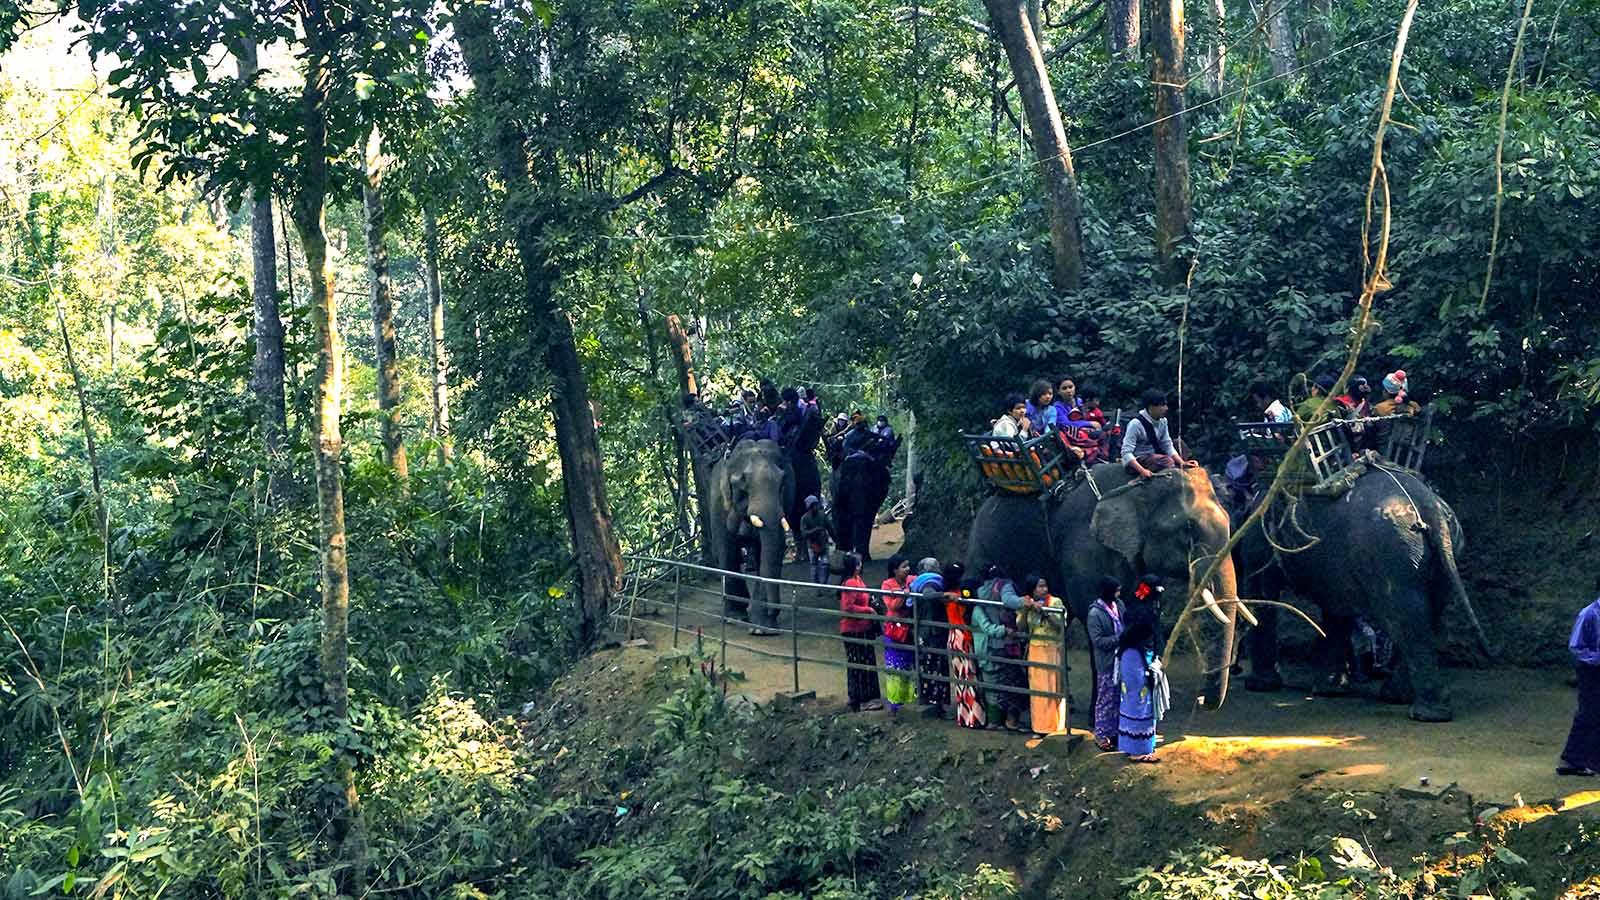 Pilgrims take elephant ride to Alaungdaw Kathapa cave at the Alaungdaw Kathapa National Park. Photo: Than Htay Aung (Kani)